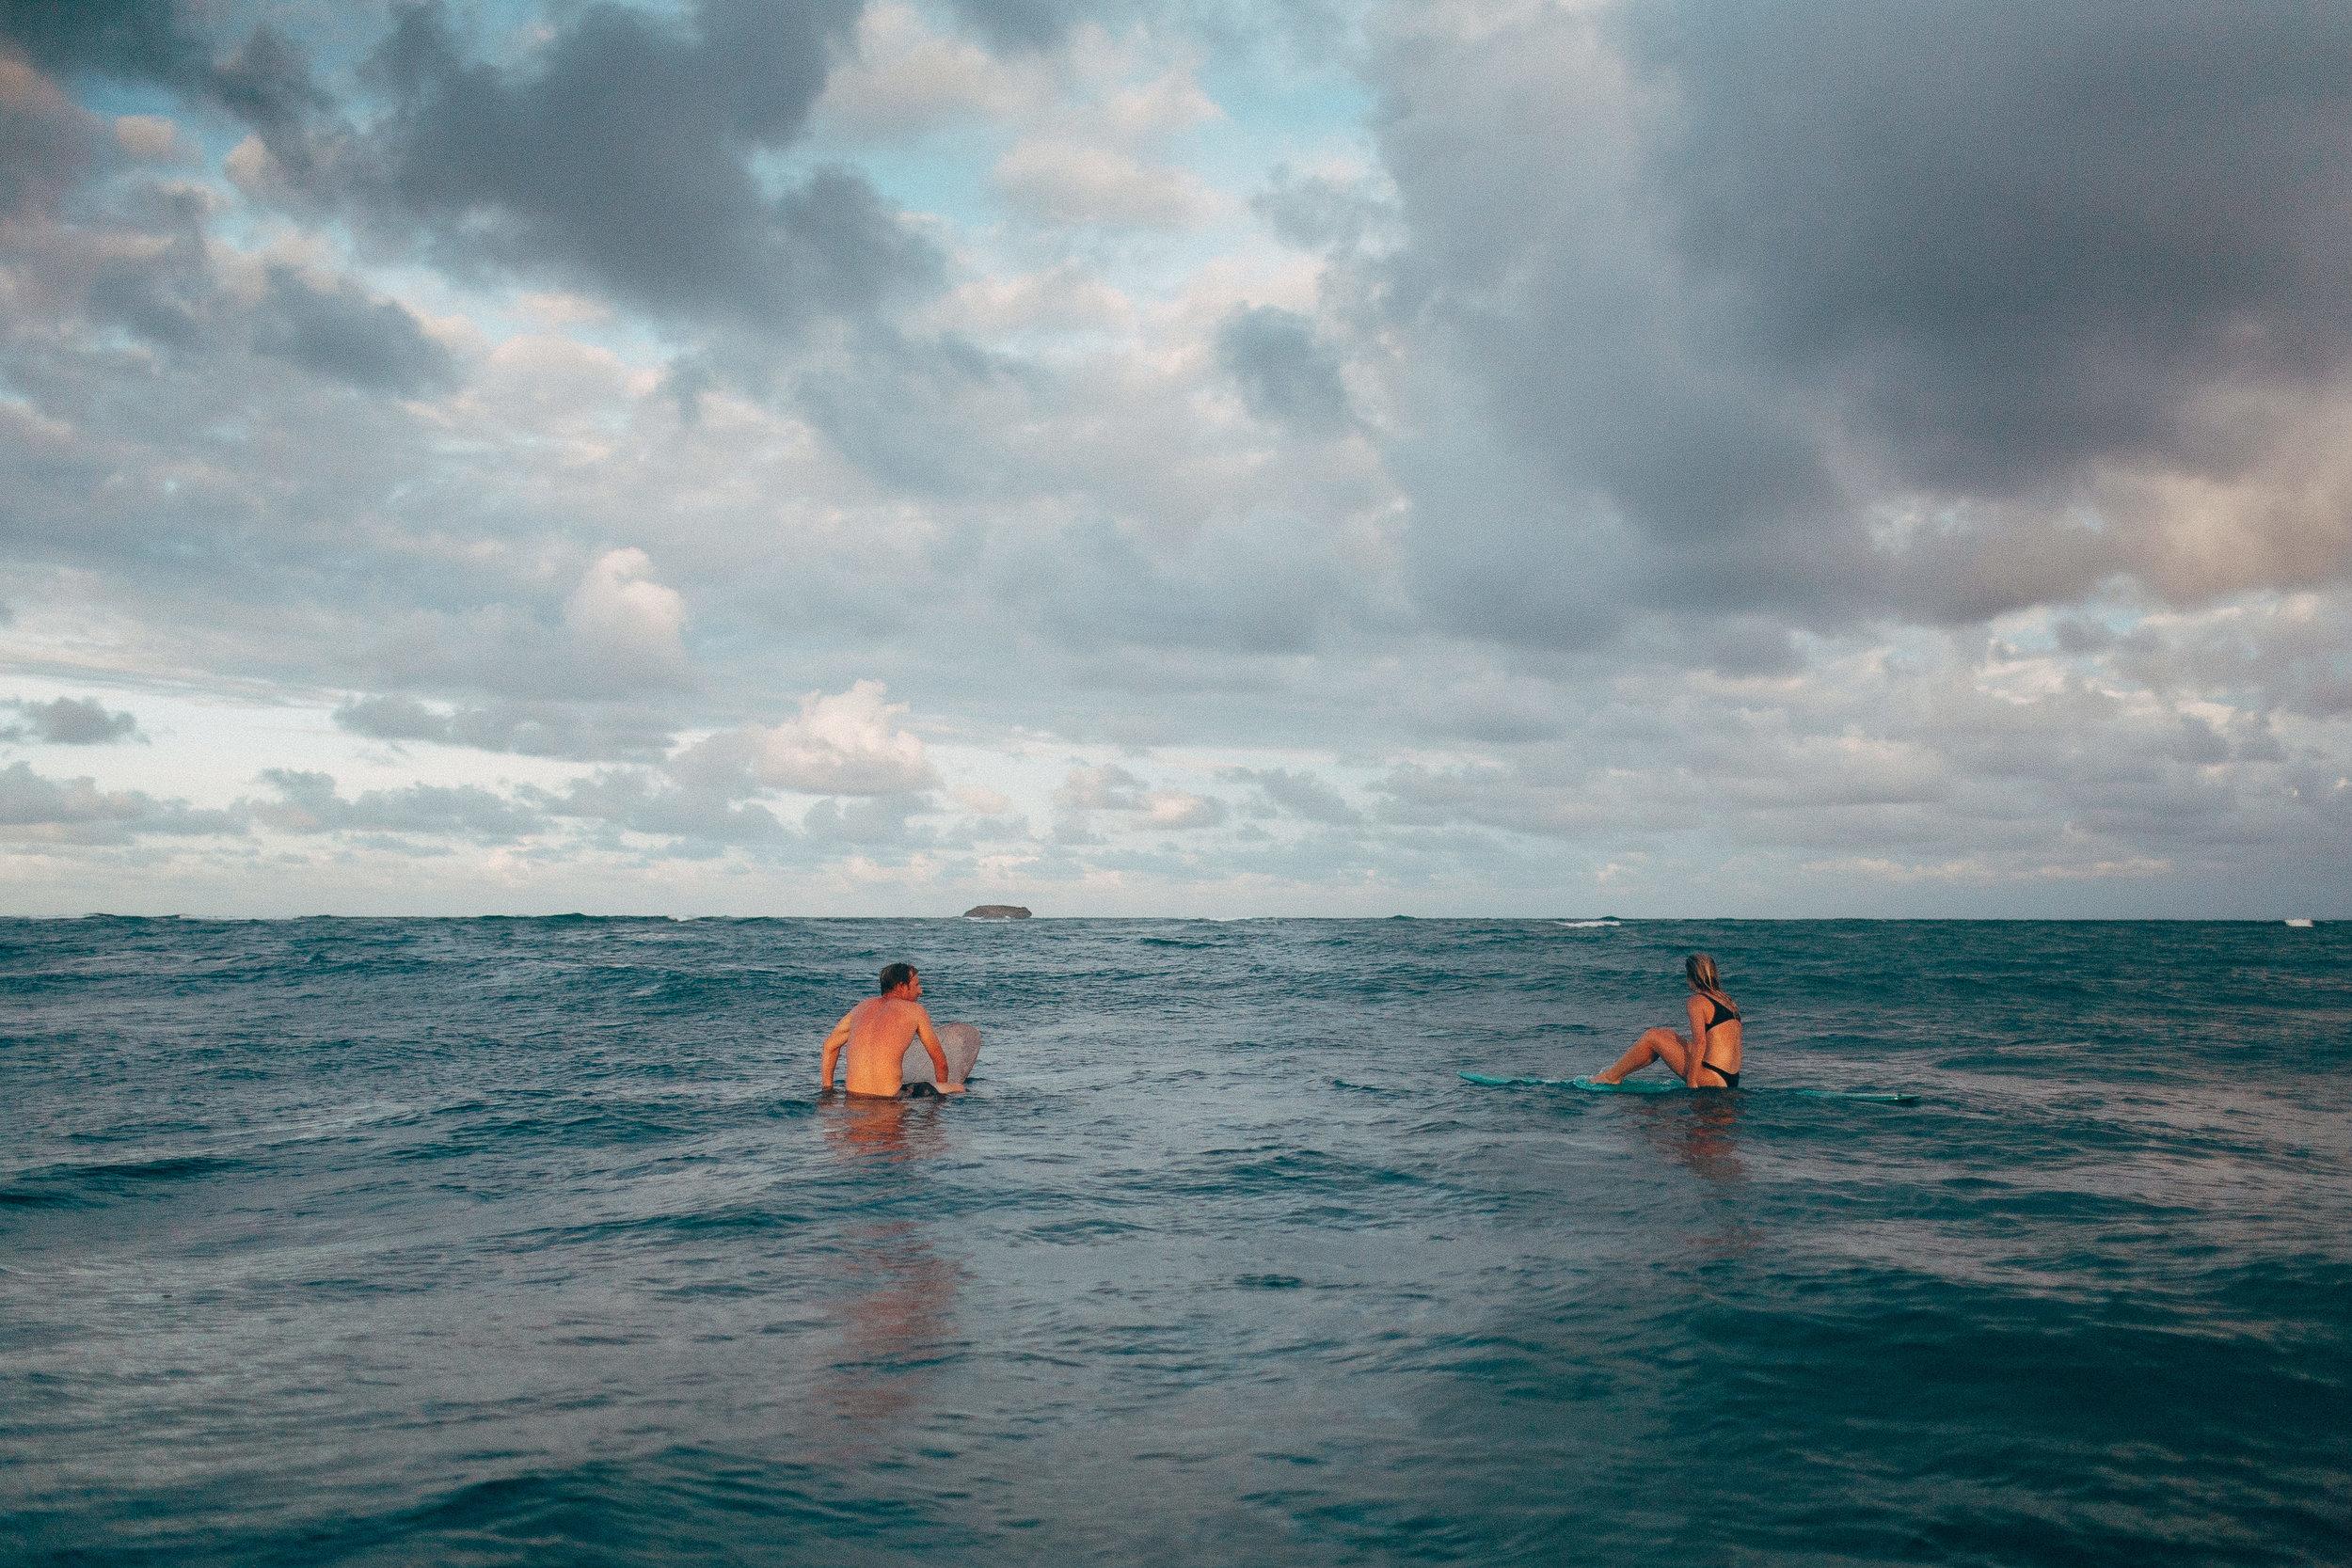 Underwater Wedding Engagement Photos Surfing in the Water Adventurous Photographers Lake Michigan